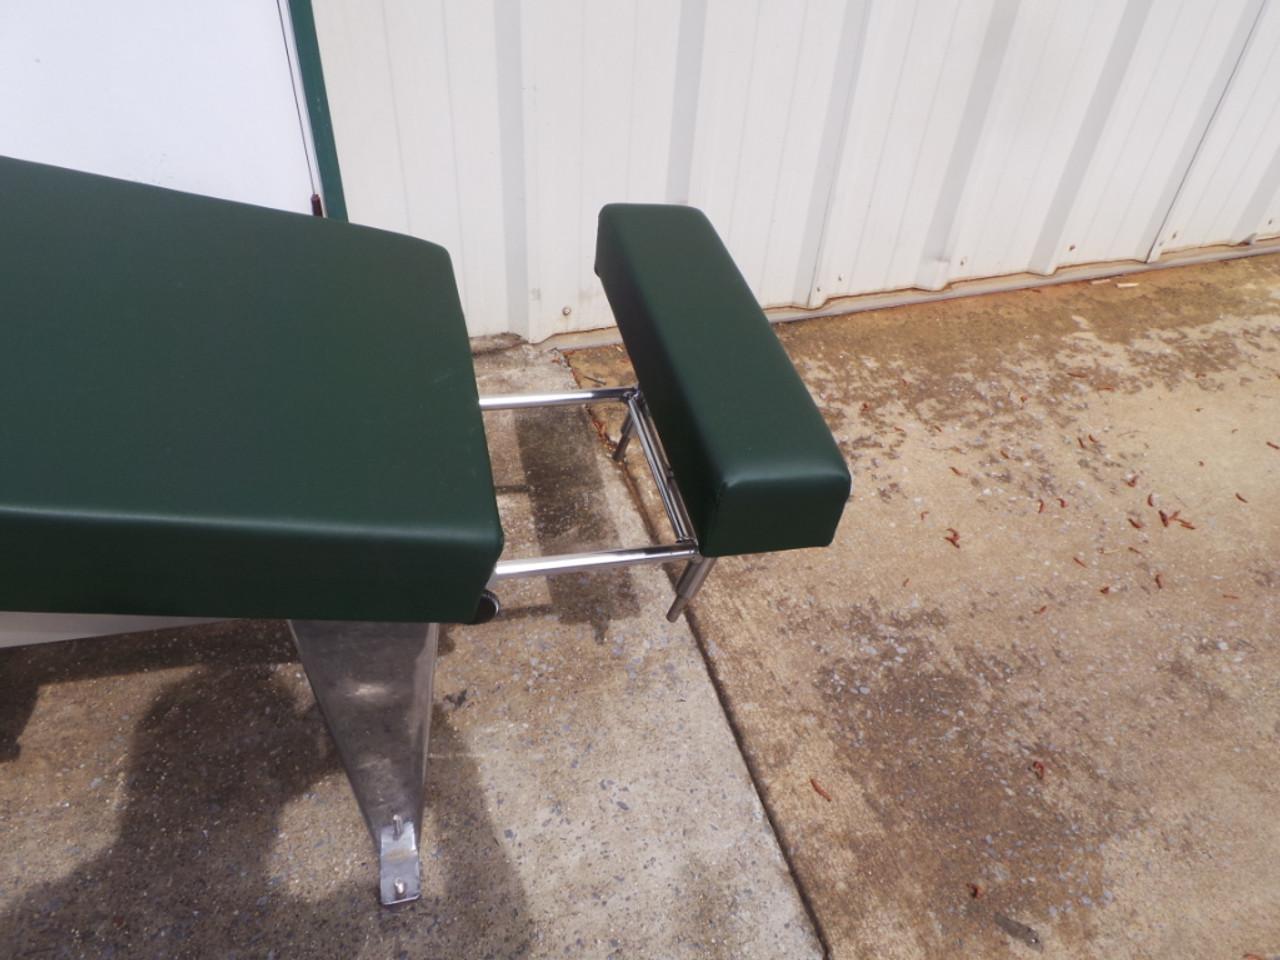 Used Lloyd Galaxy Stationary Table with Pelvic Drop